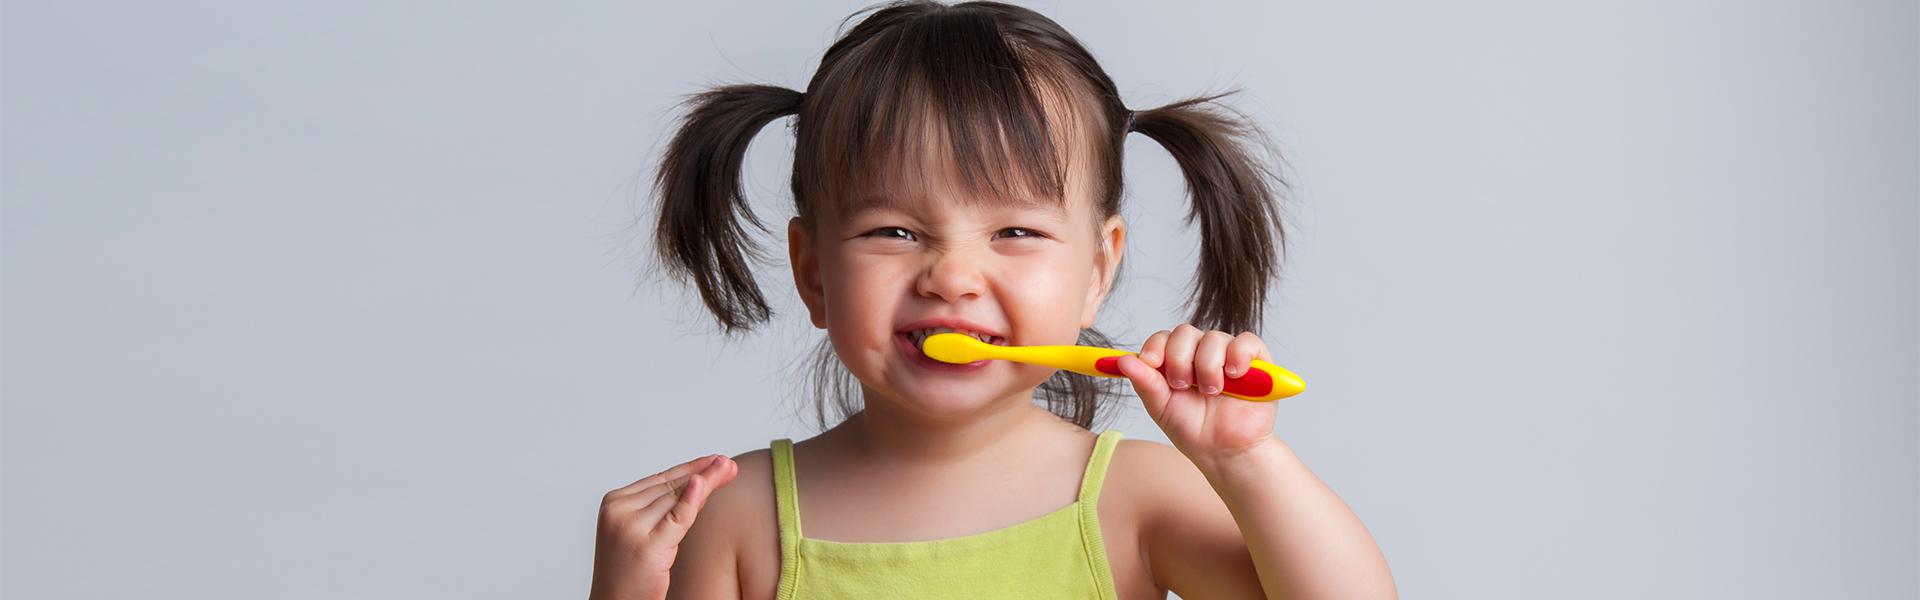 Pediatric Dentist in Suffern, NY